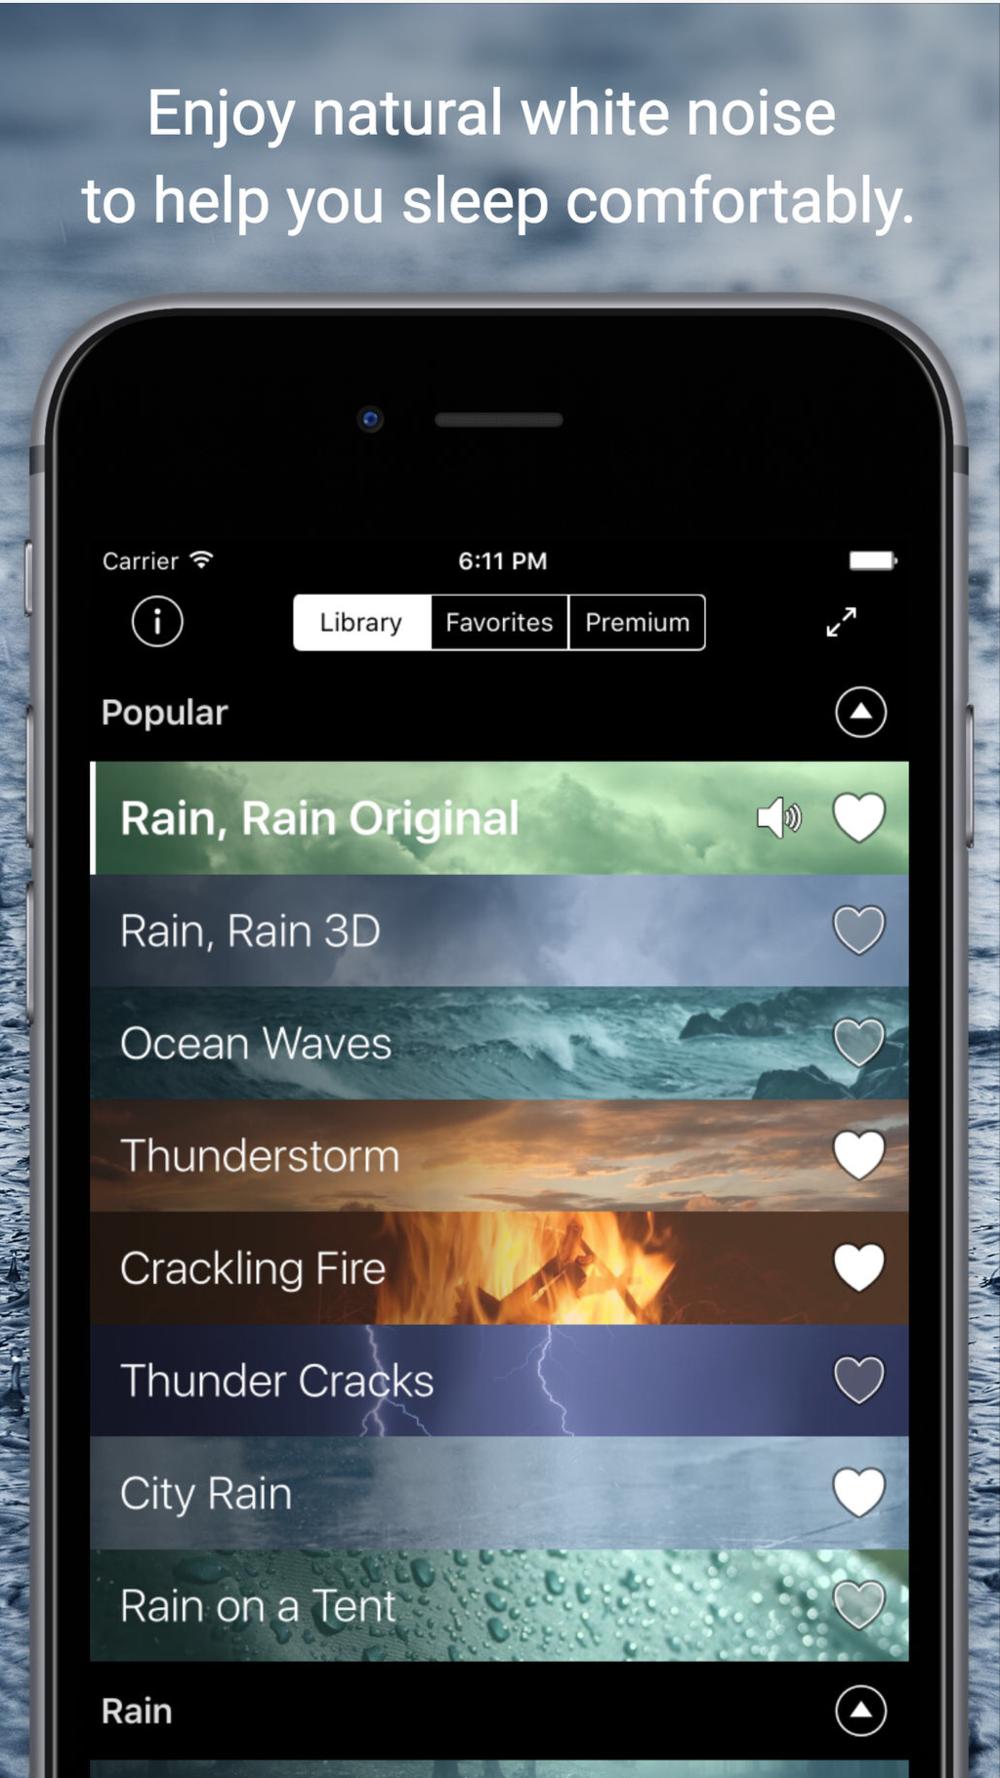 sam-c-perry-3-products-that-will-help-you-sleep-better-rain-rain-app-image-1.jpg